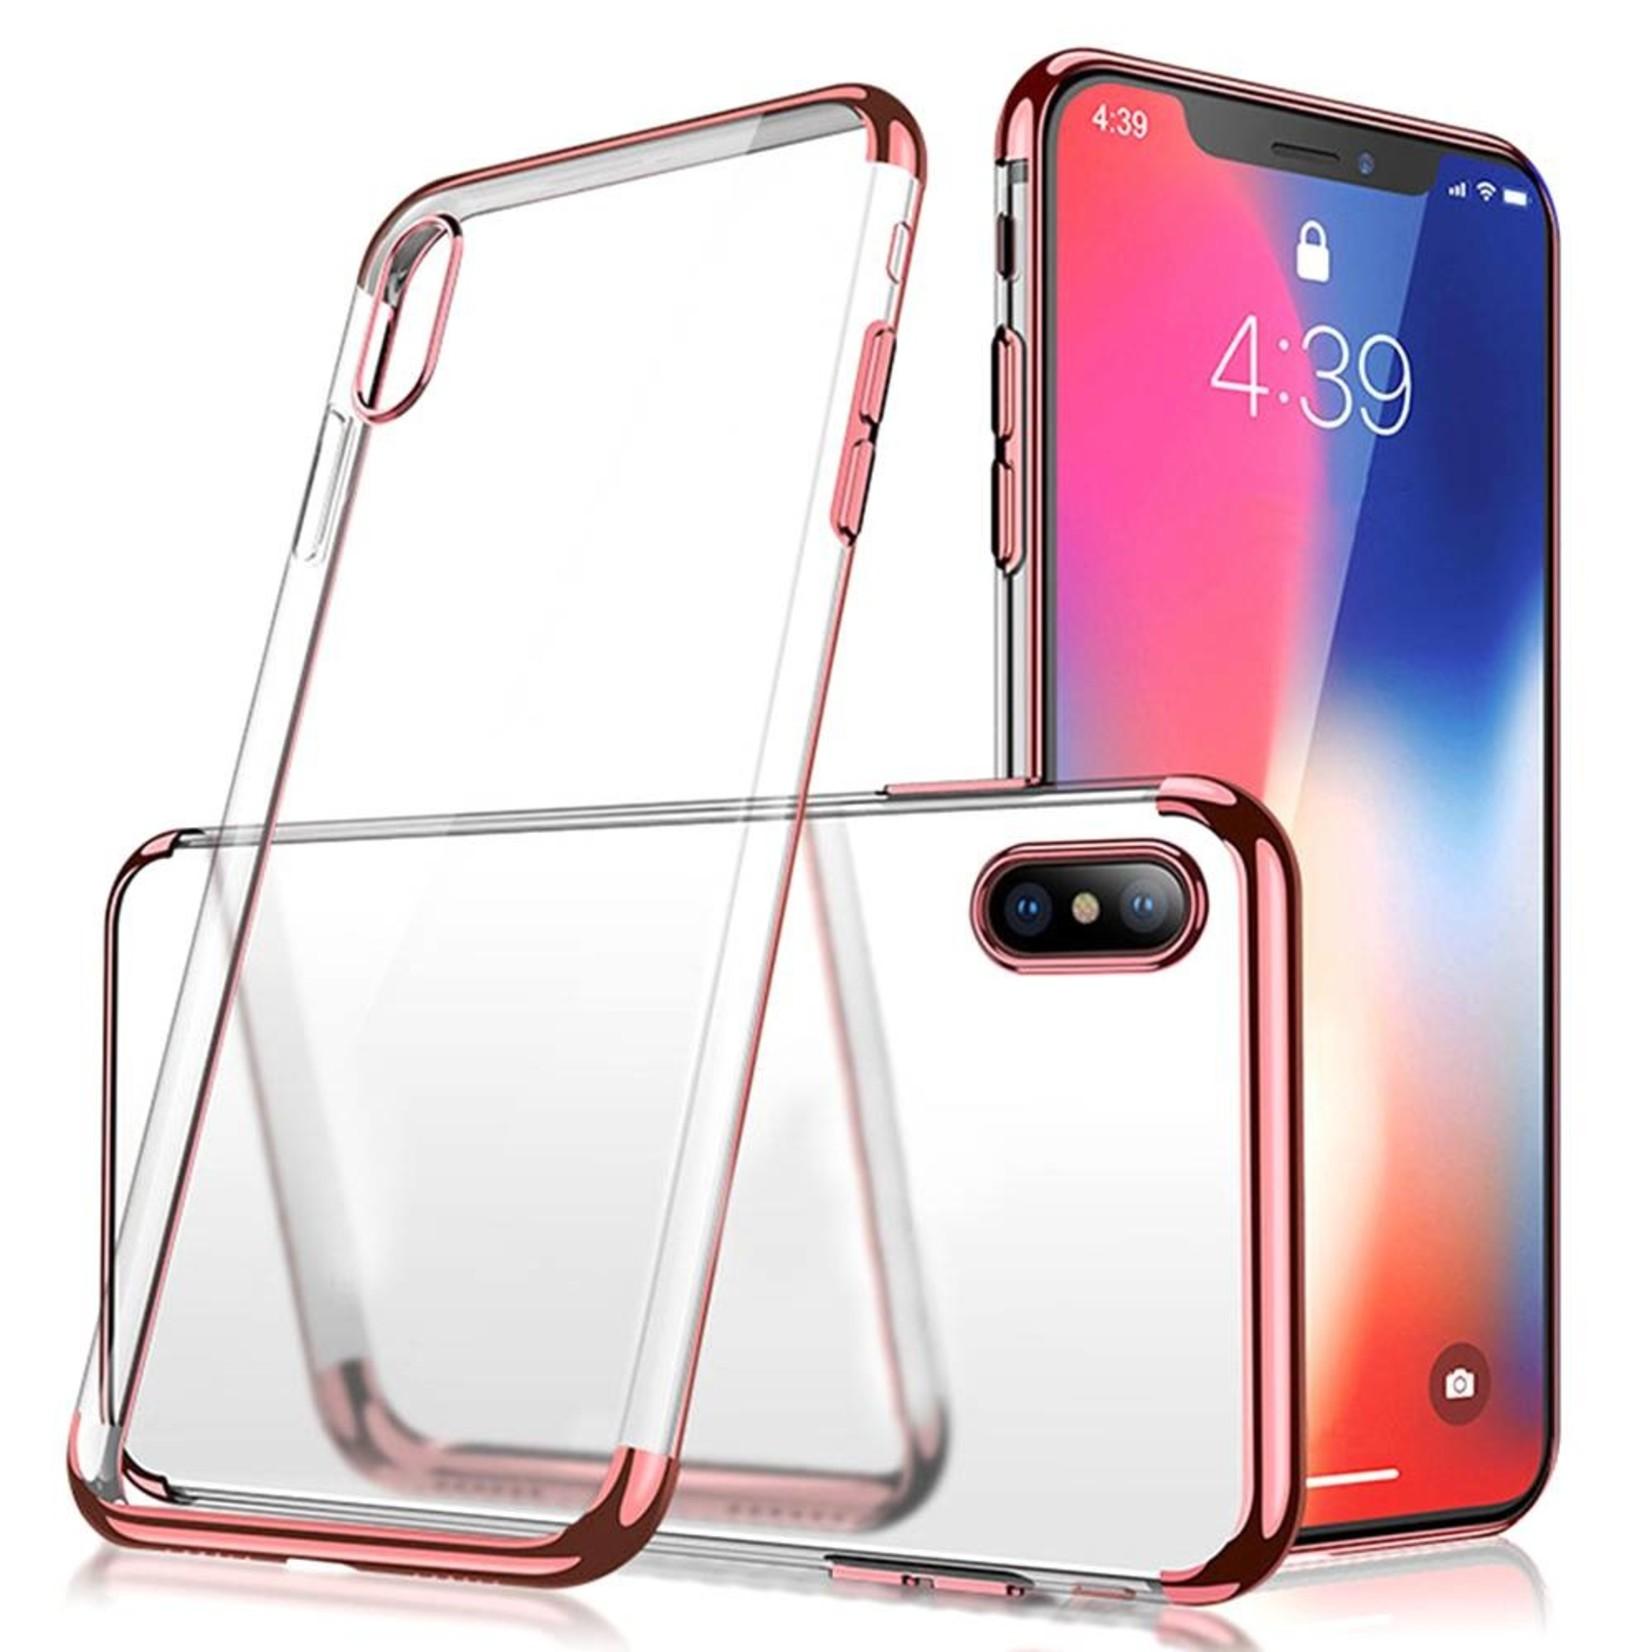 Colorfone Hoesje CoolSkin Bumper Clear voor Apple iPhone X/Xs Rosé Goud